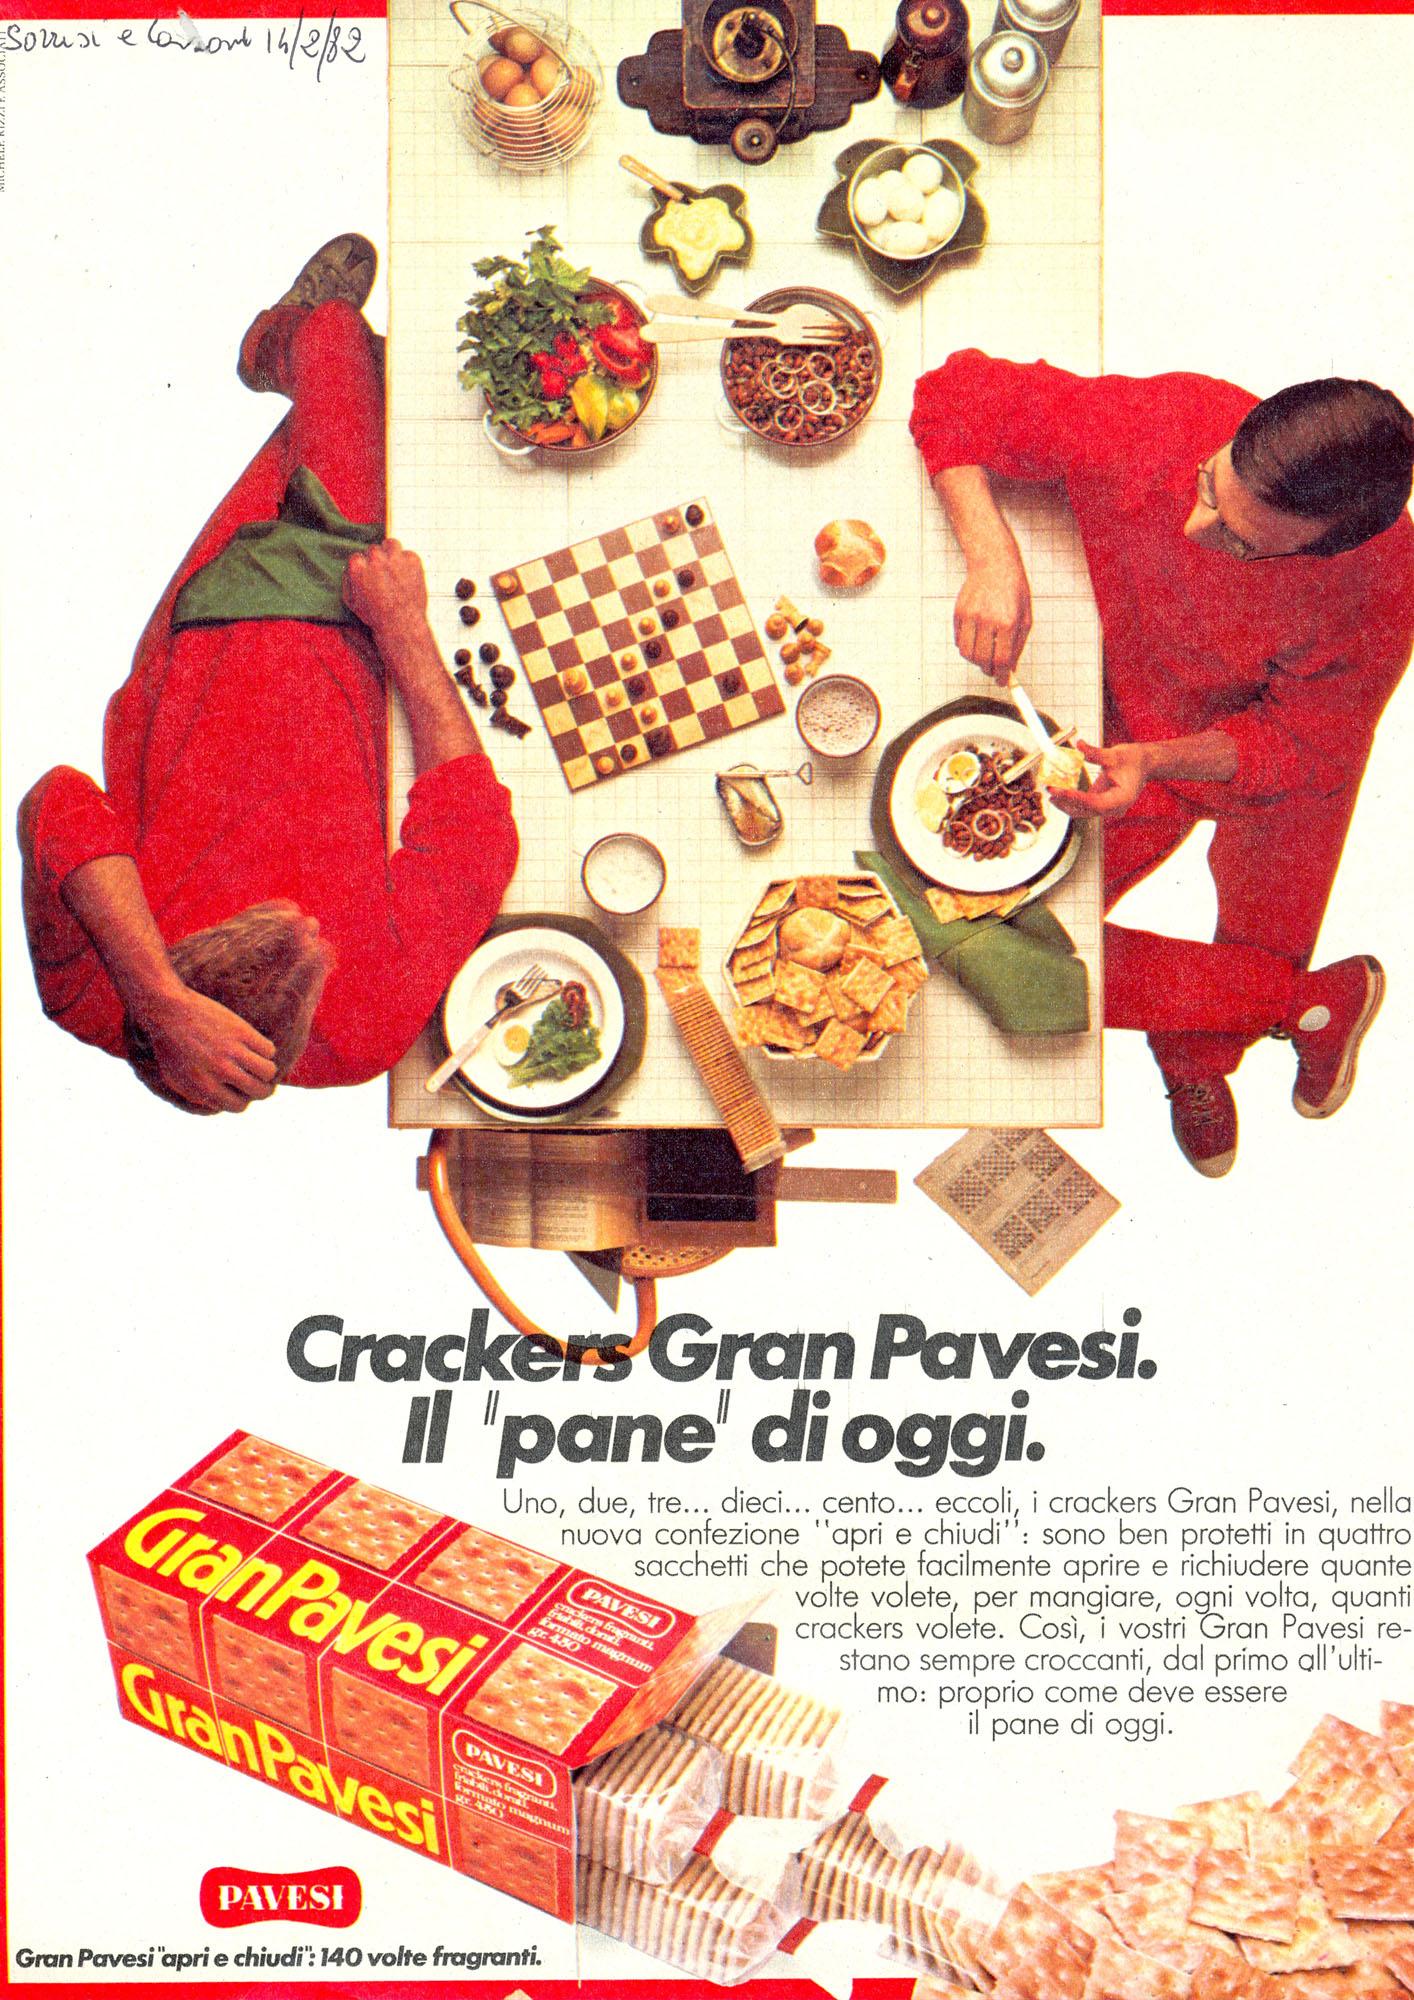 Press advertising Gran Pavesi Crackers, 1982